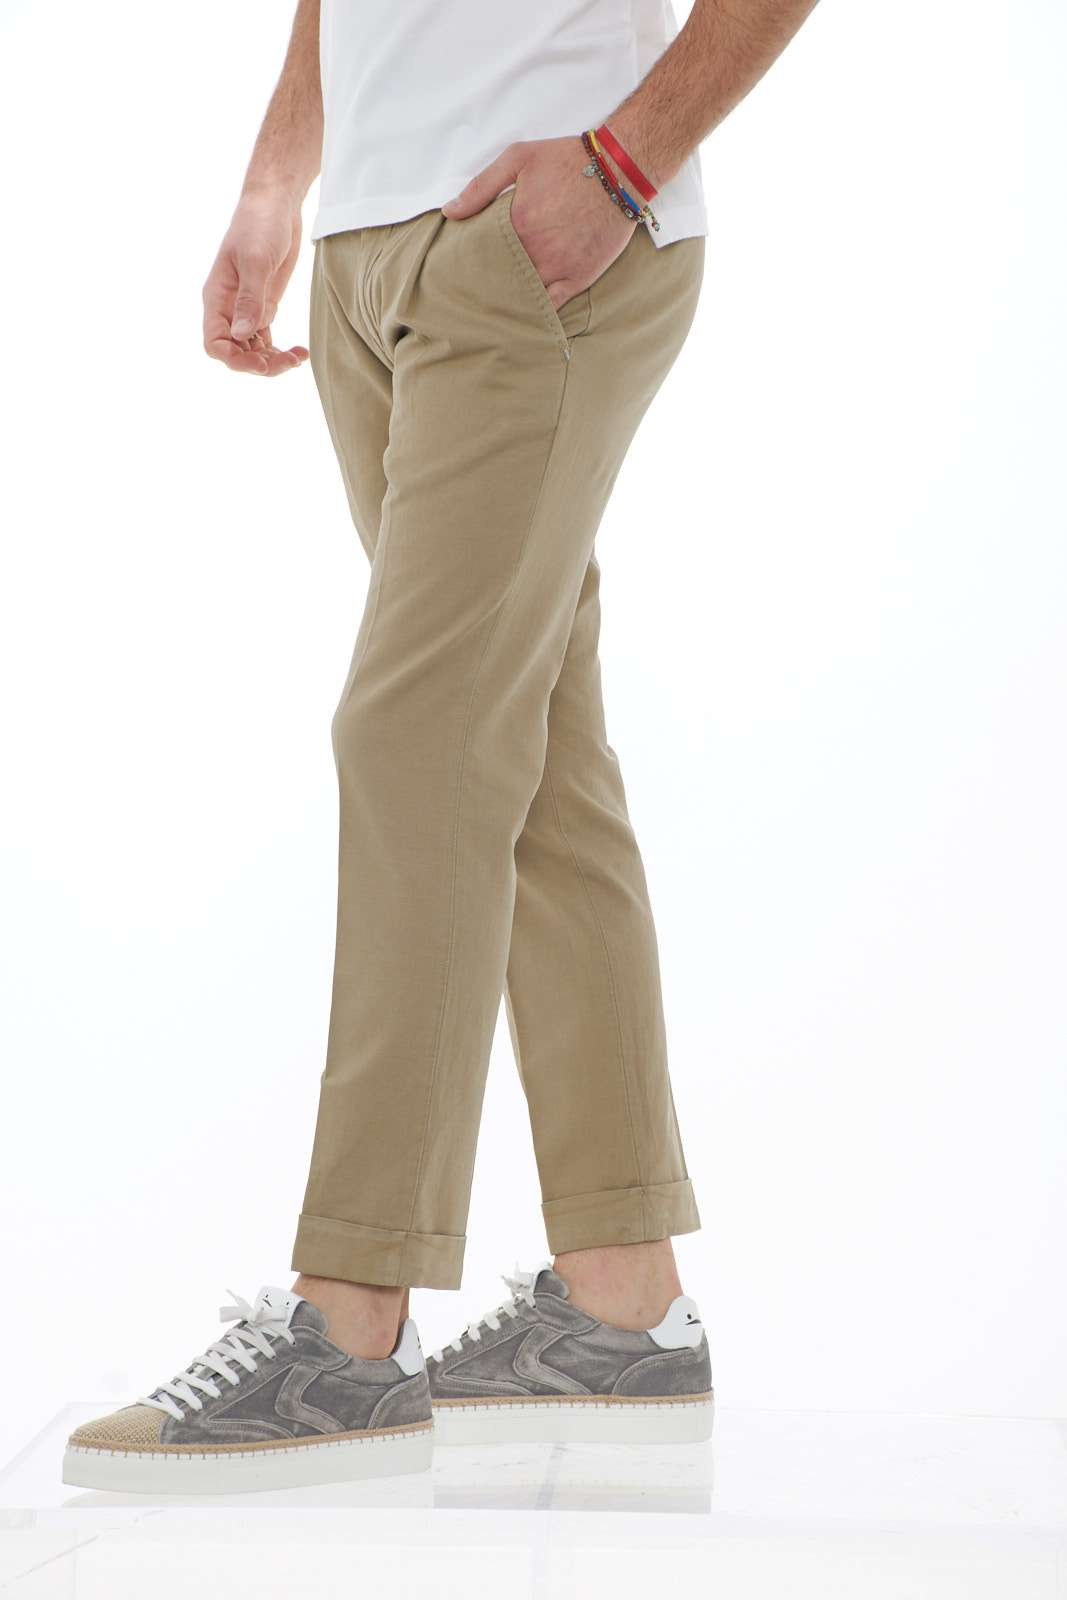 https://www.parmax.com/media/catalog/product/a/i/PE-outlet_parmax-pantaloni-uomo-FREDERICK3340-B.jpg